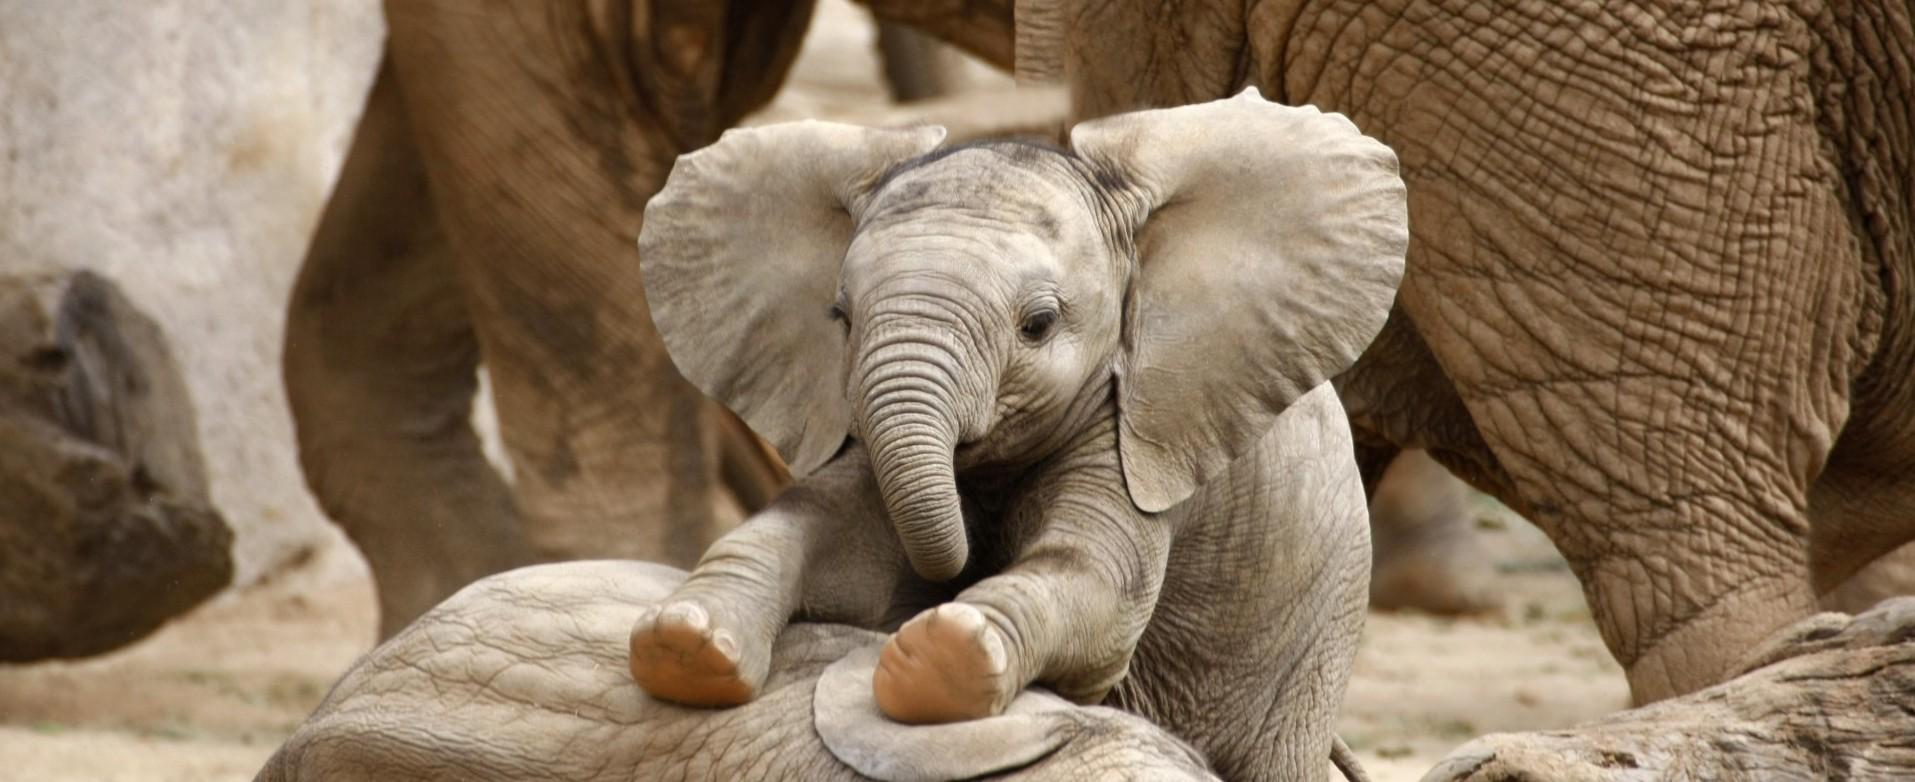 Djikee elephant